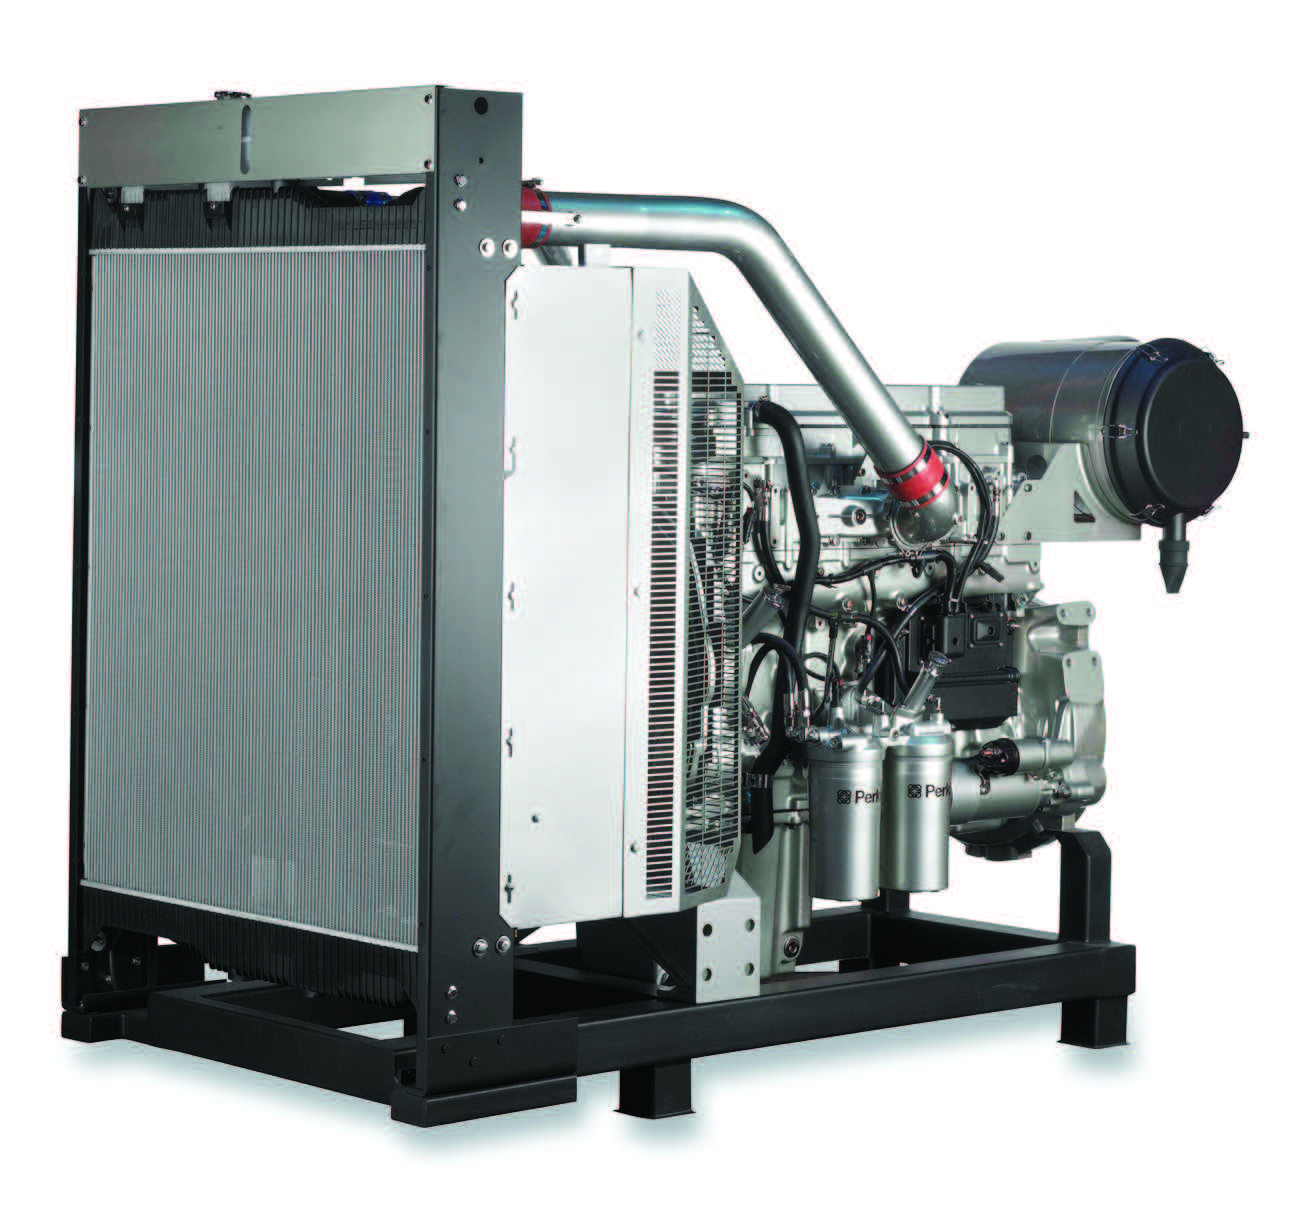 2206A-E13TAG5 Diesel Engine – ElectropaK